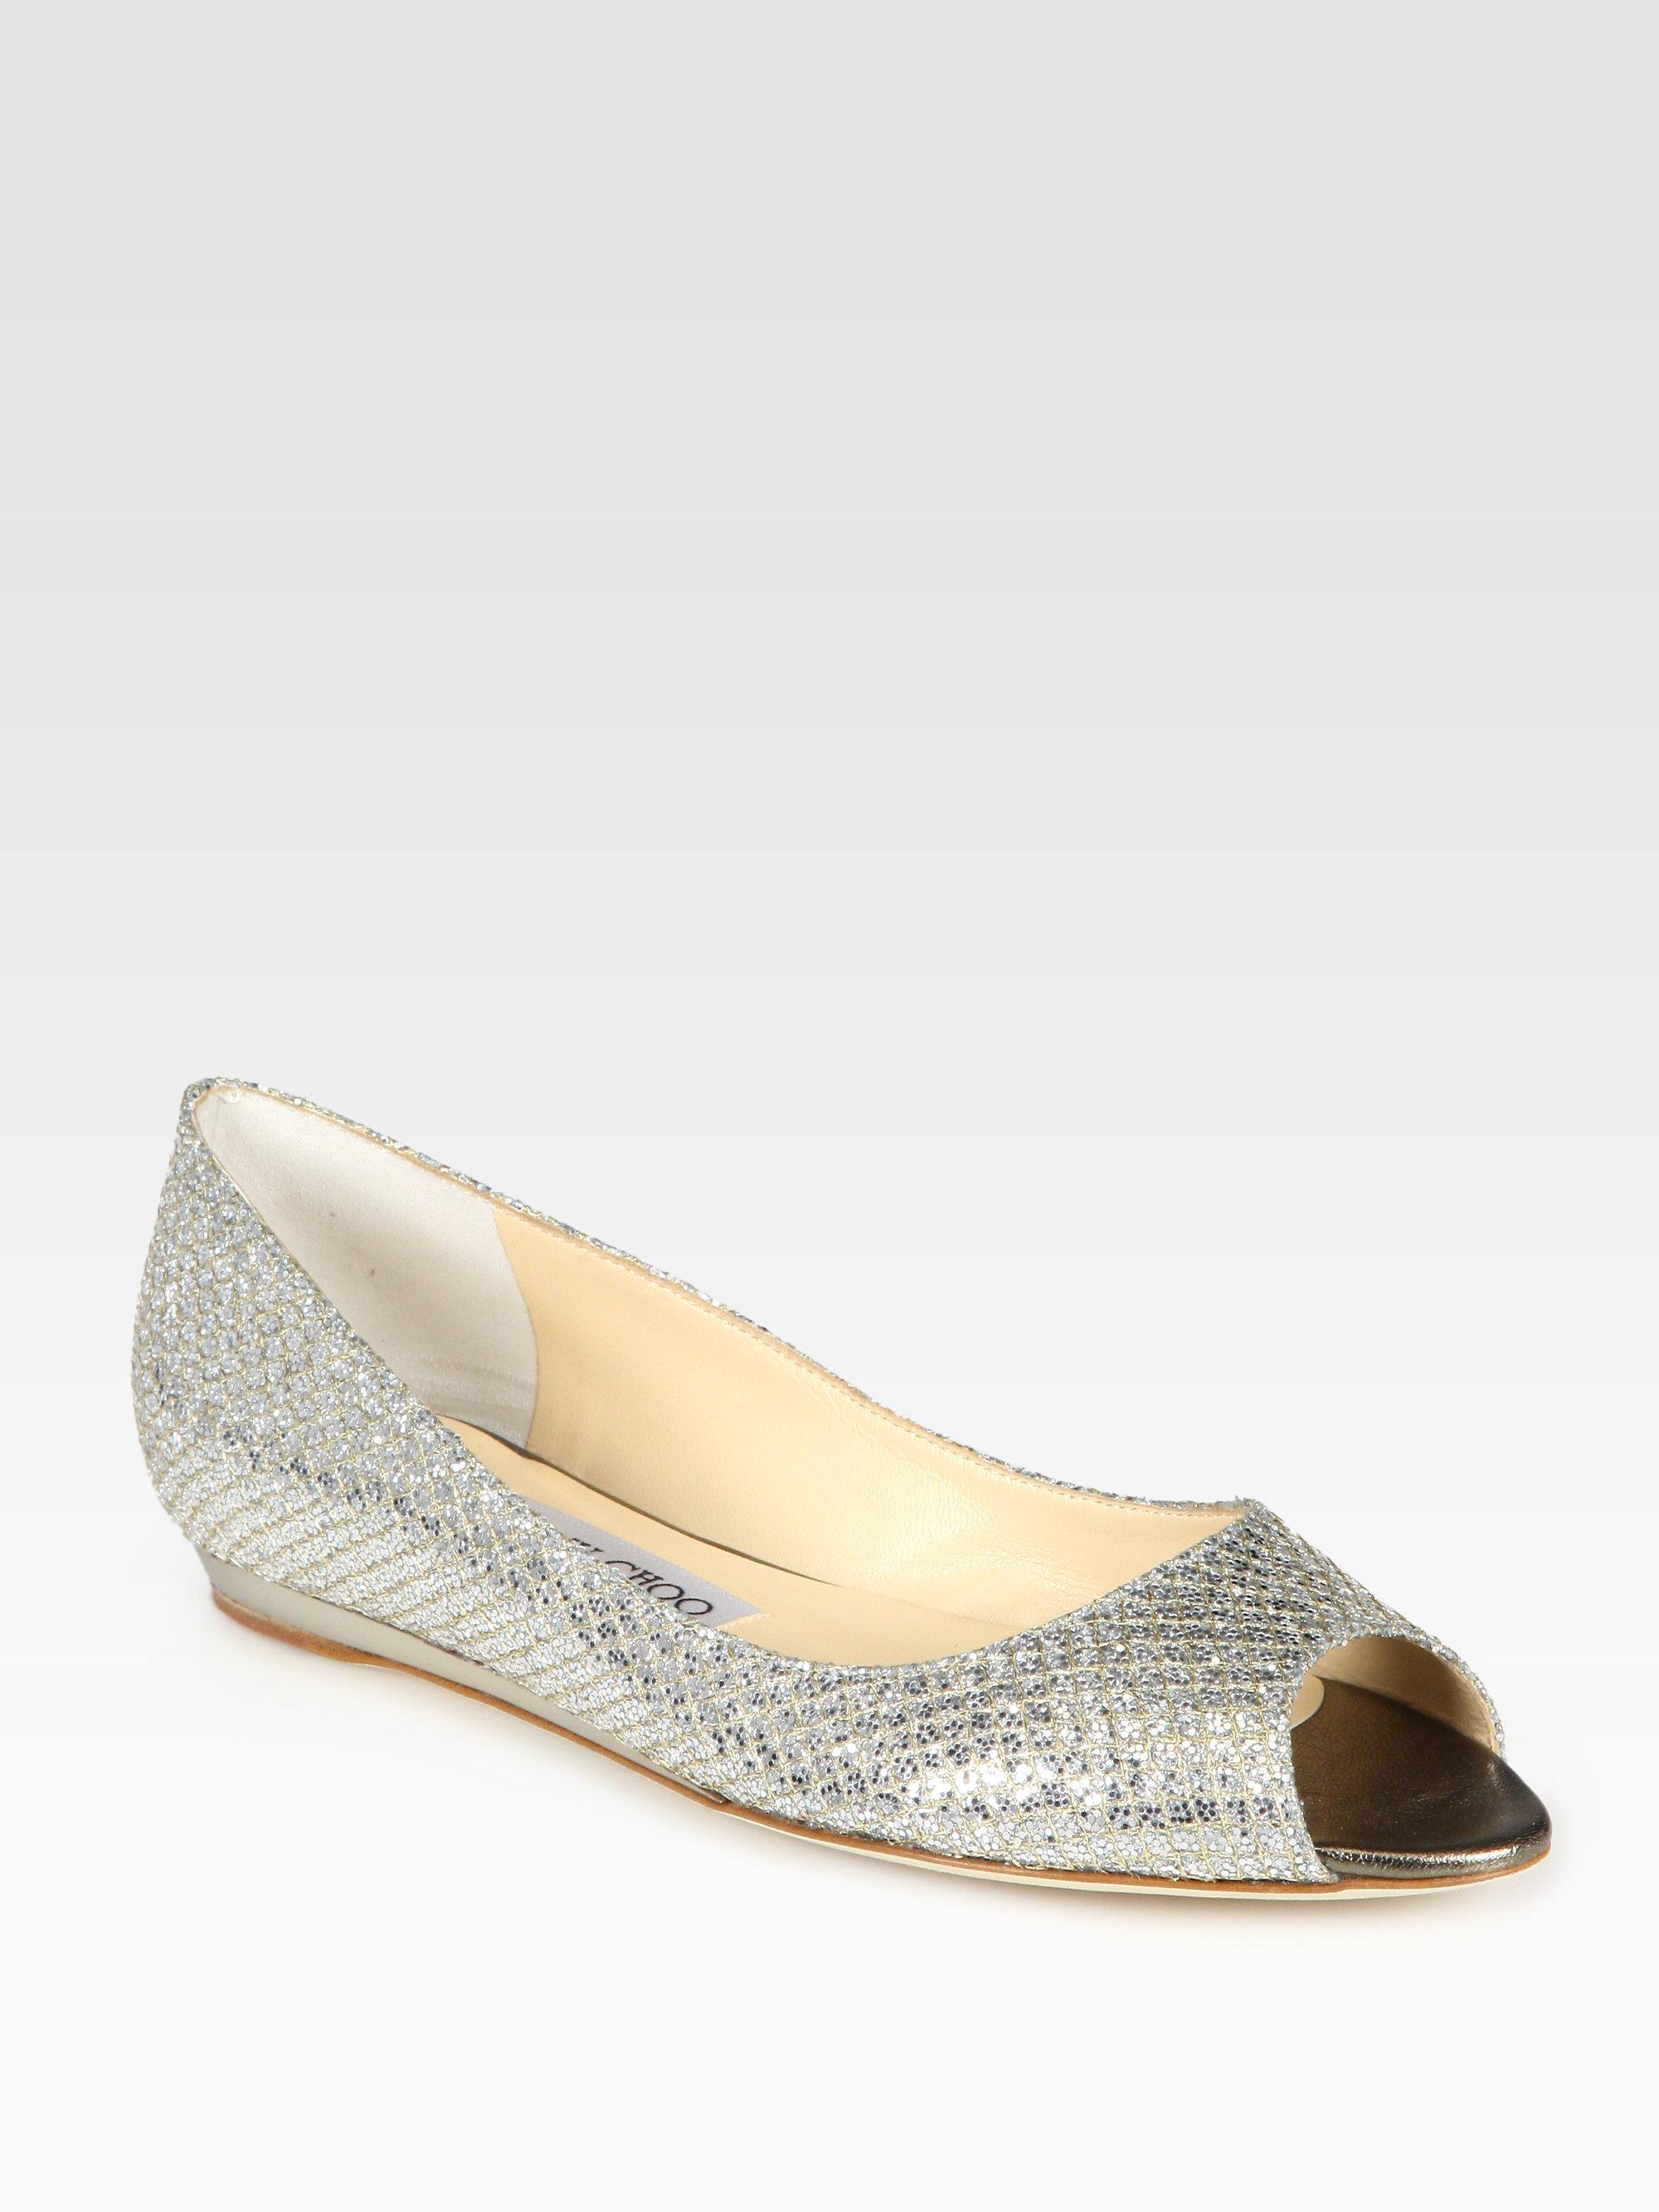 7b93cbea7d6e Jimmy Choo Beck Glitter-coated Metallic Leather Peep Toe Ballet ...